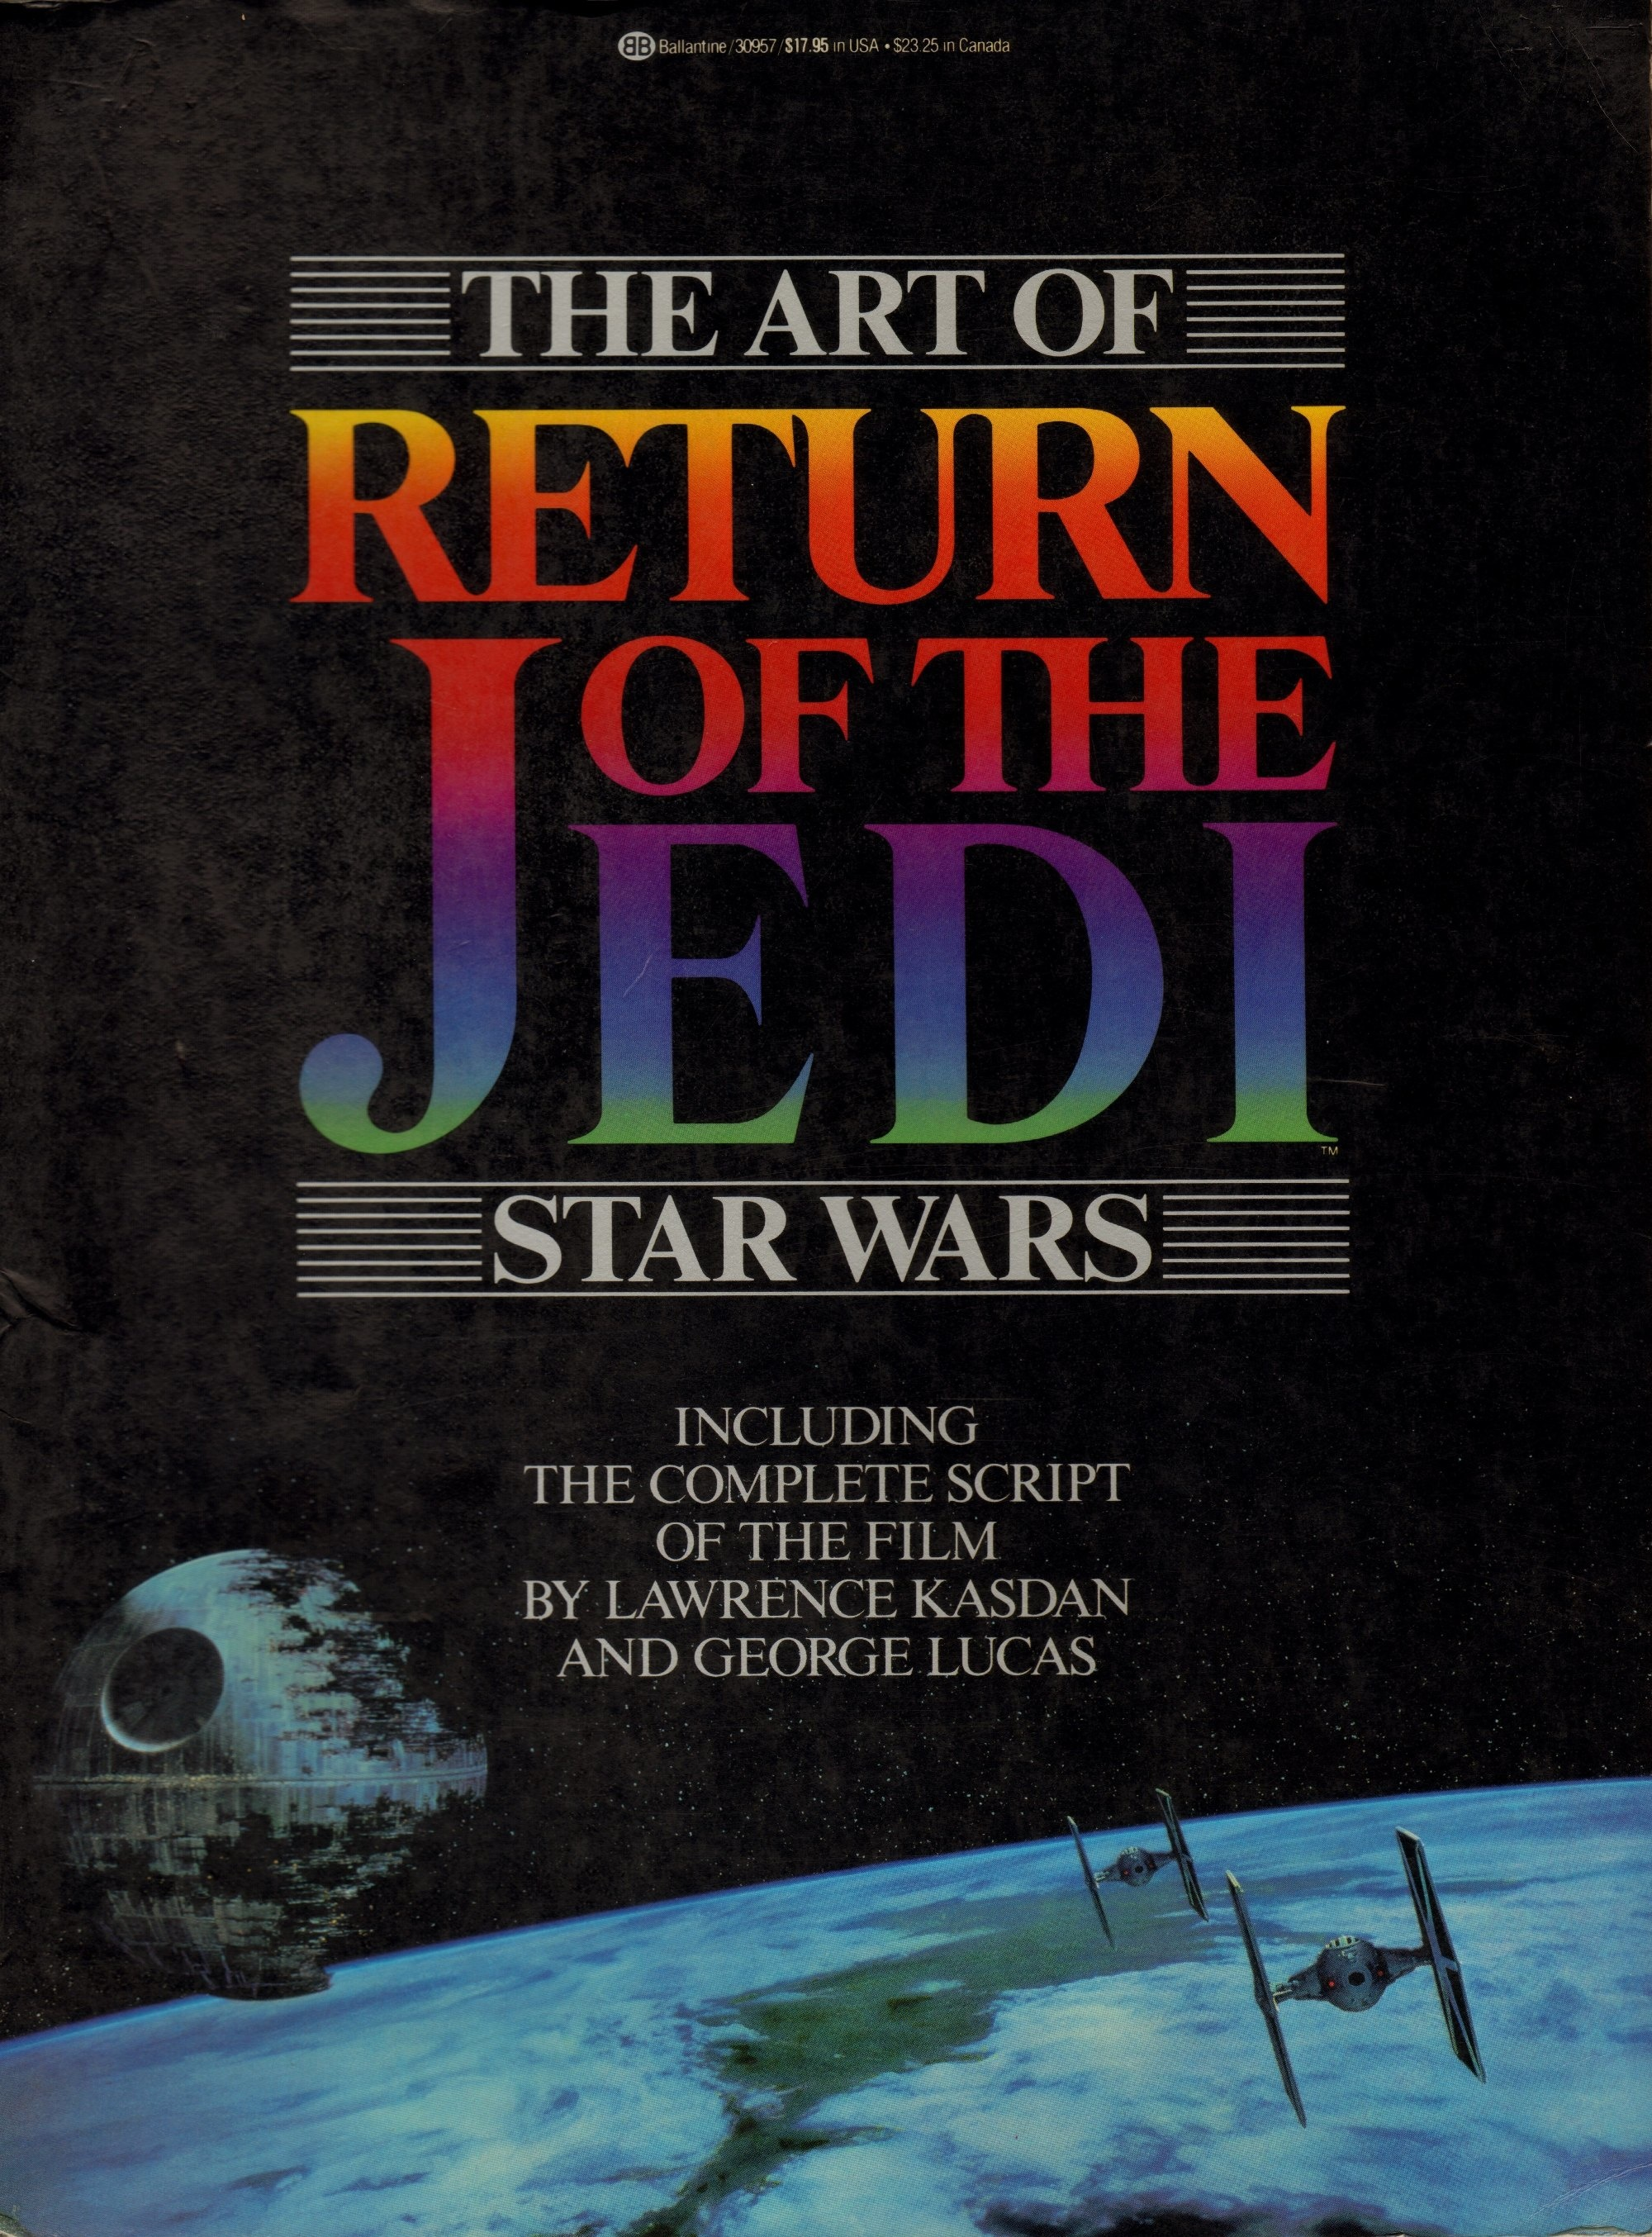 Art of Return of the Jedi (b0bafett_Empire)-p000a